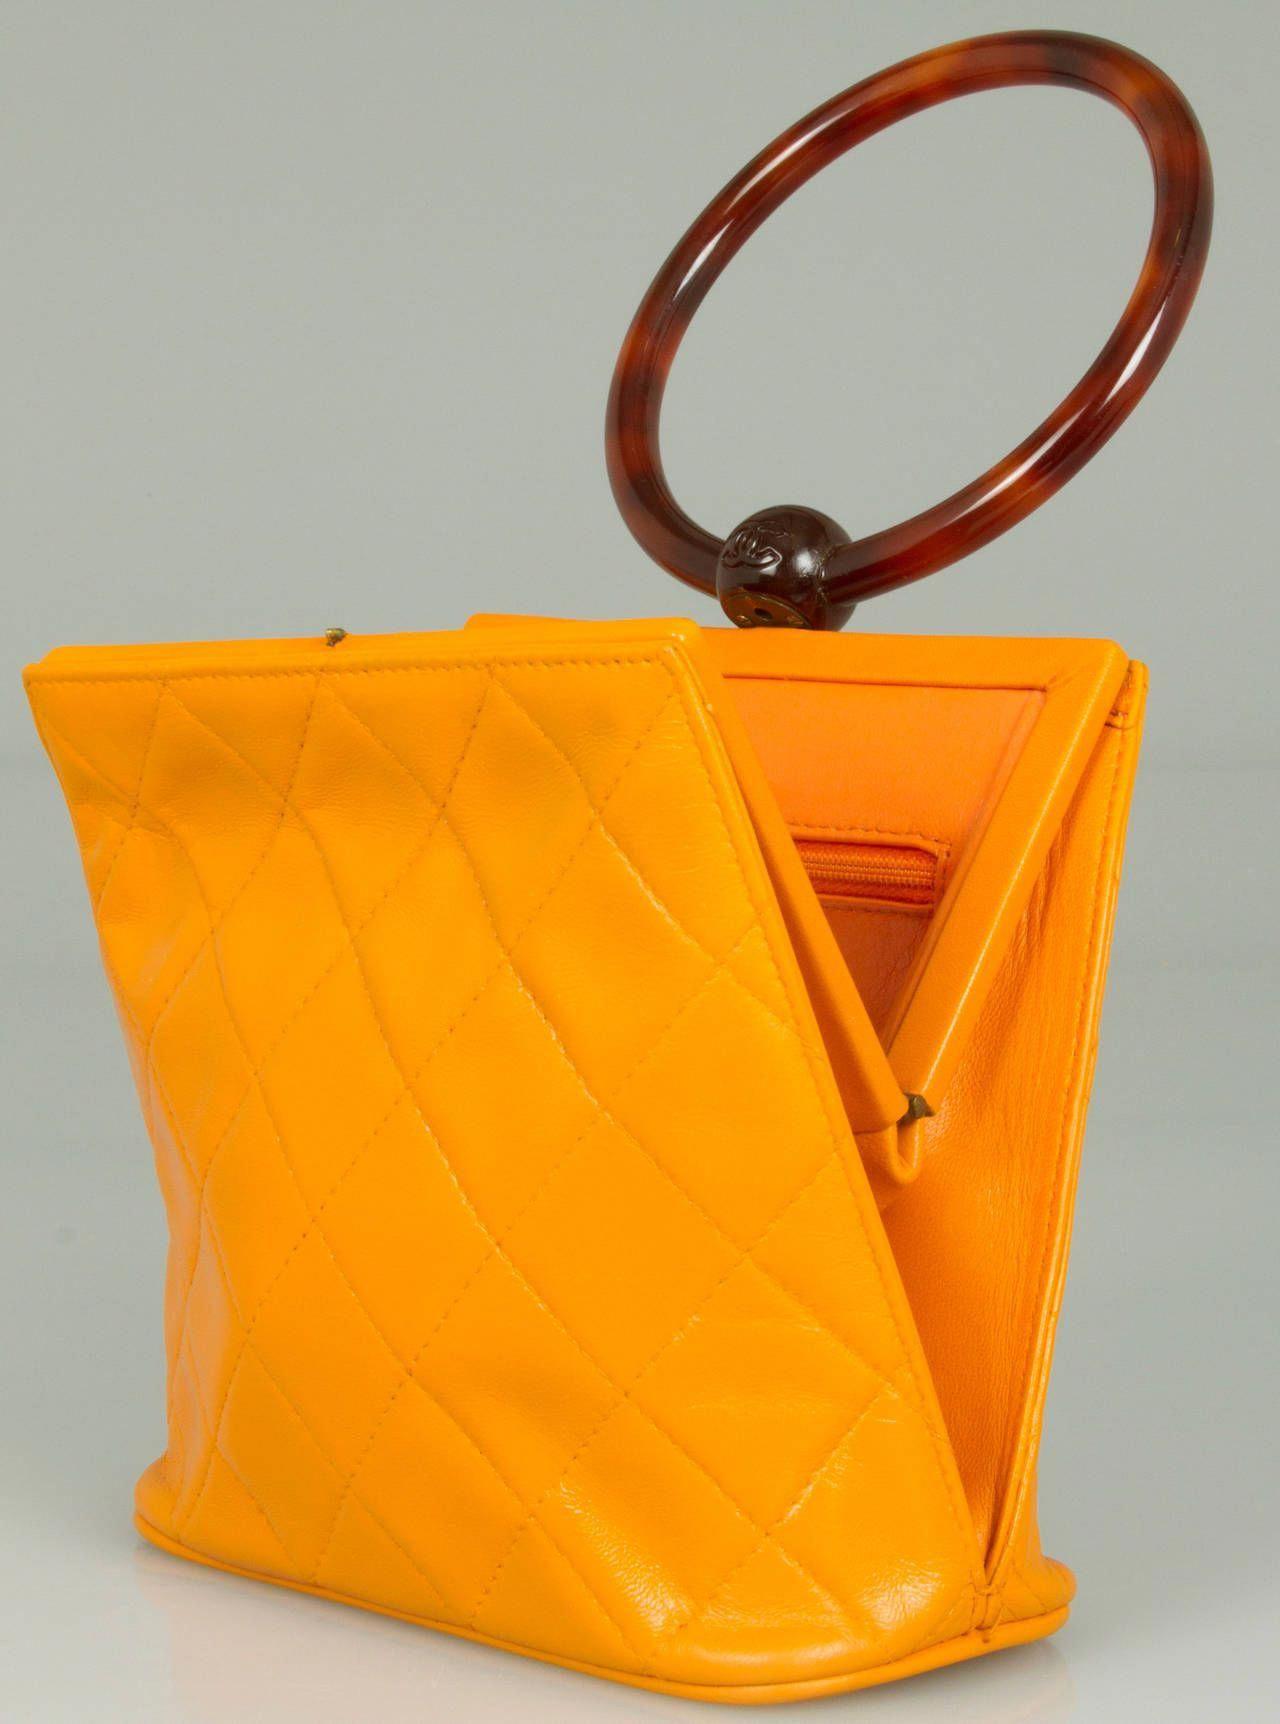 520b5fead481 Fun CHANEL Handbag with Round Handle | 1stdibs.com #Chanelhandbags ...